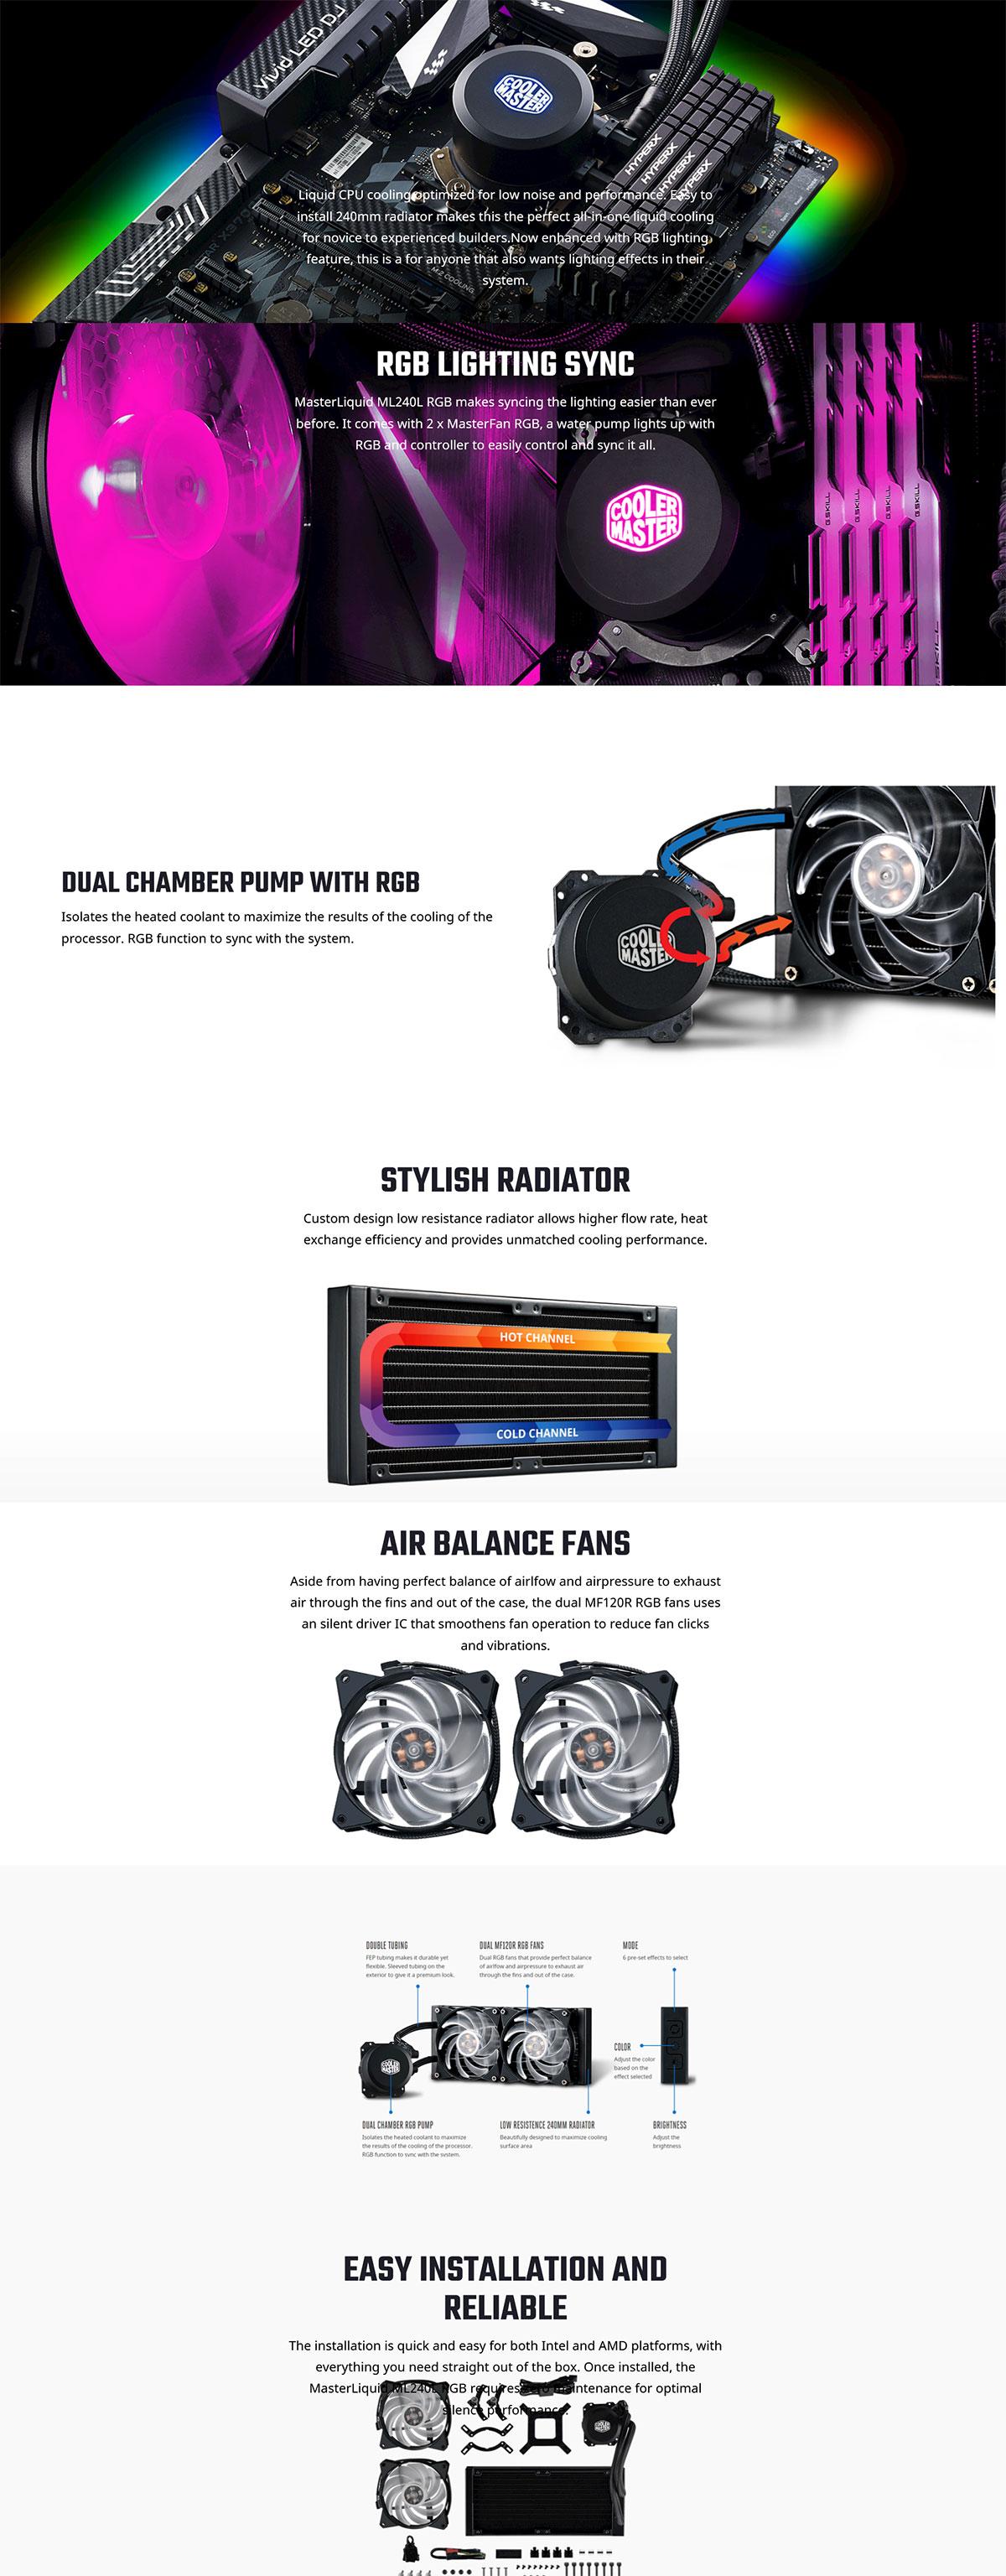 Cooler Master RGB Controller MFY-RCSN-NNUDK-R1 Intro